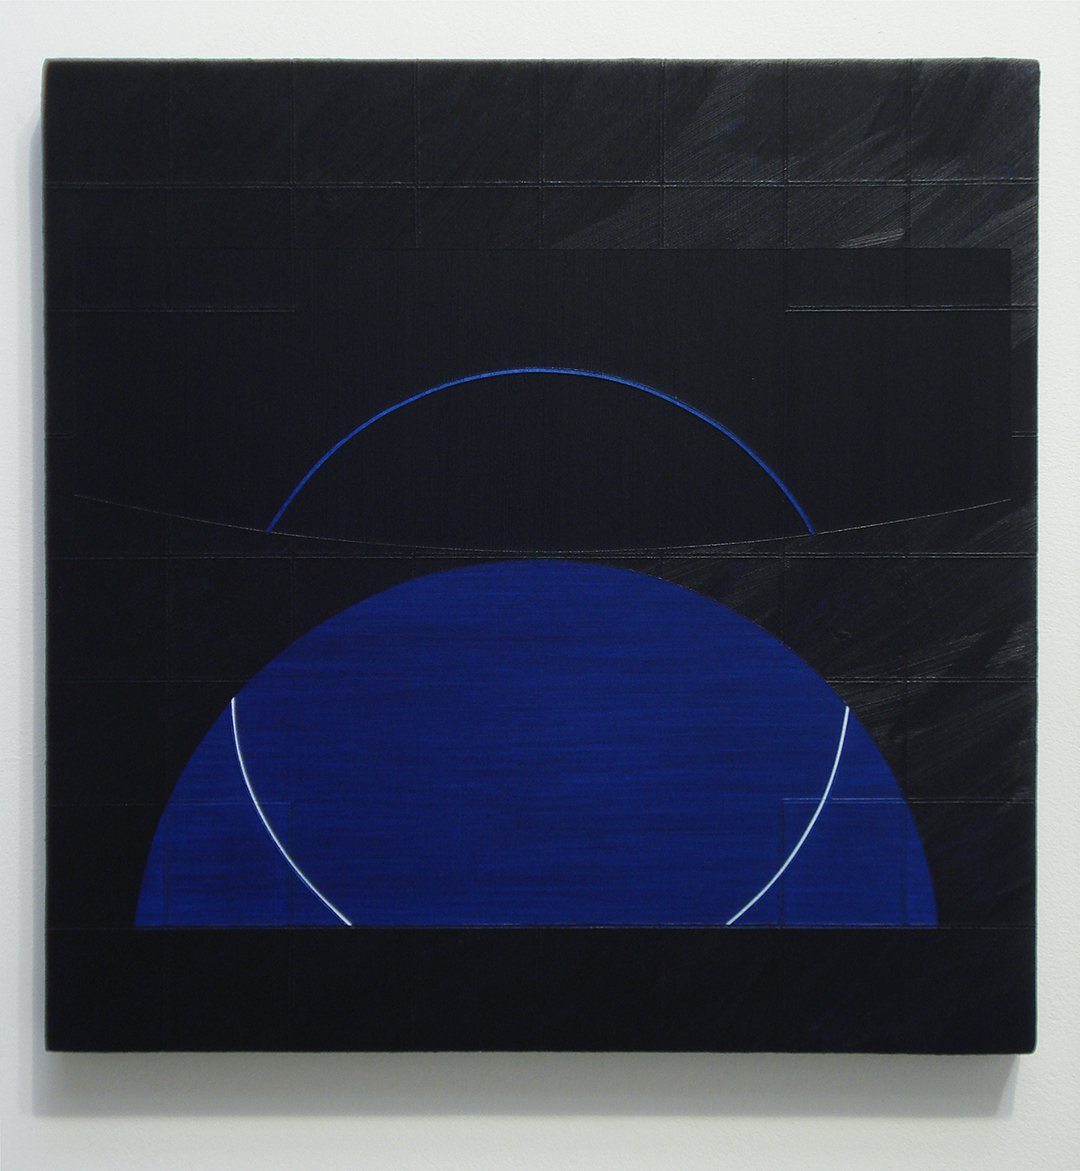 Above-metrum[20190618]_2019_acrylic-on-canvas, 17 3-4 x 17 3-4 in. [45x45cm]-3-1080.jpg